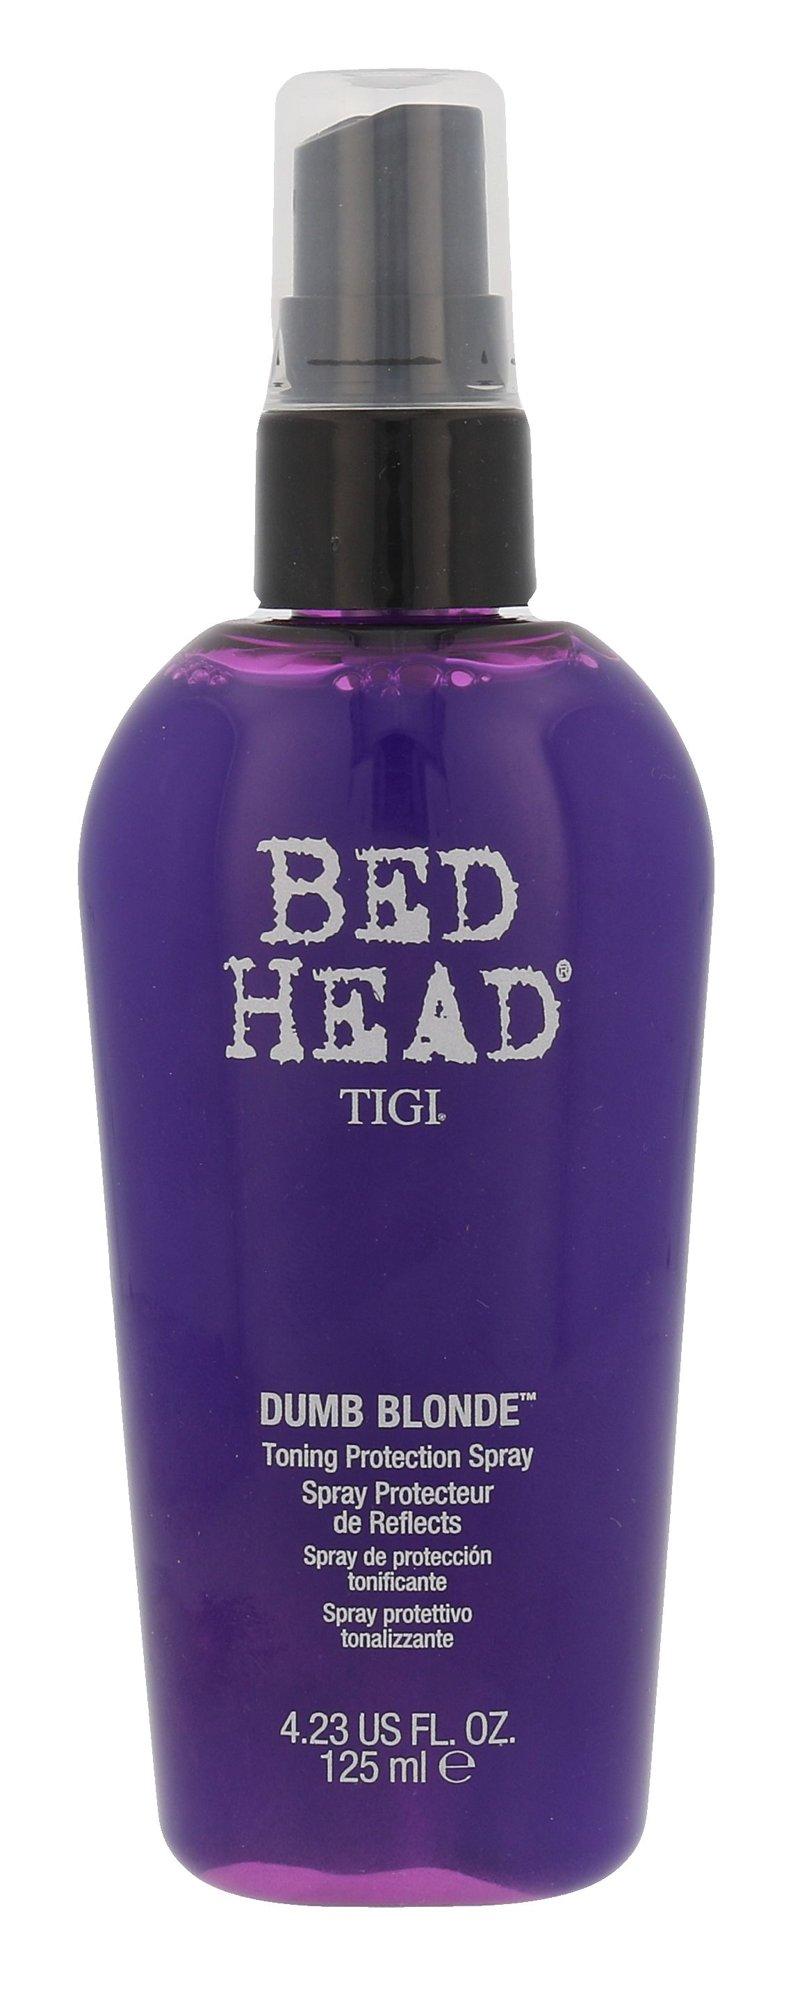 Tigi Bed Head Dumb Blonde Cosmetic 125ml